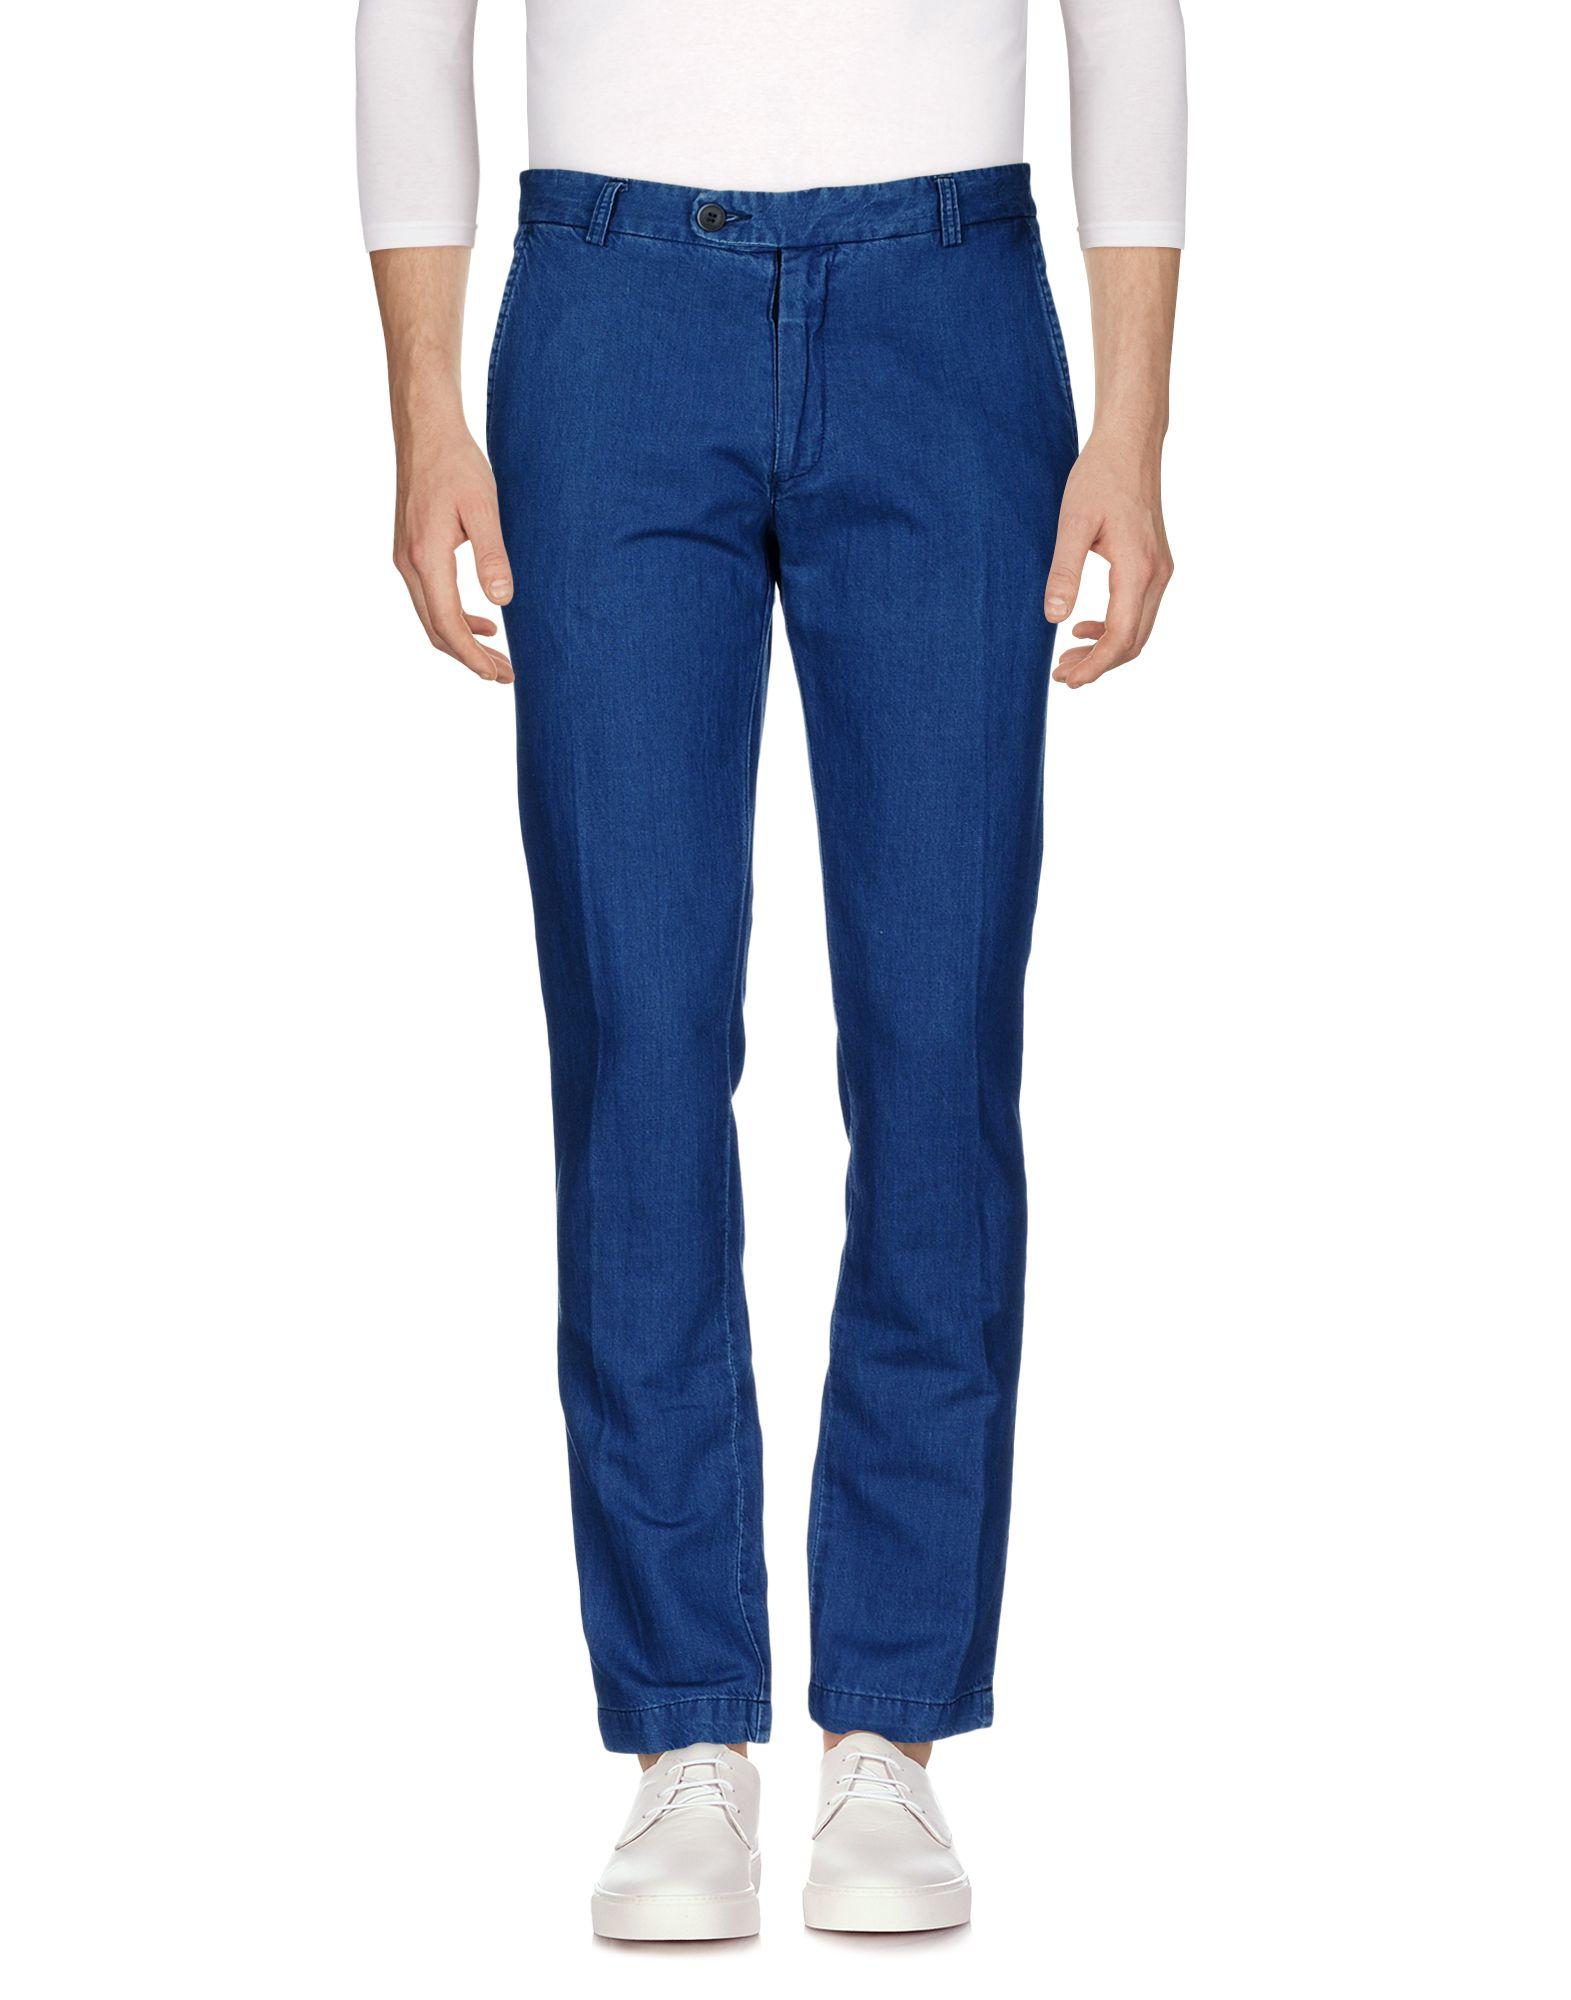 AUTHENTIC ORIGINAL VINTAGE STYLE Джинсовые брюки new japanese original authentic vfr3140 5ezc